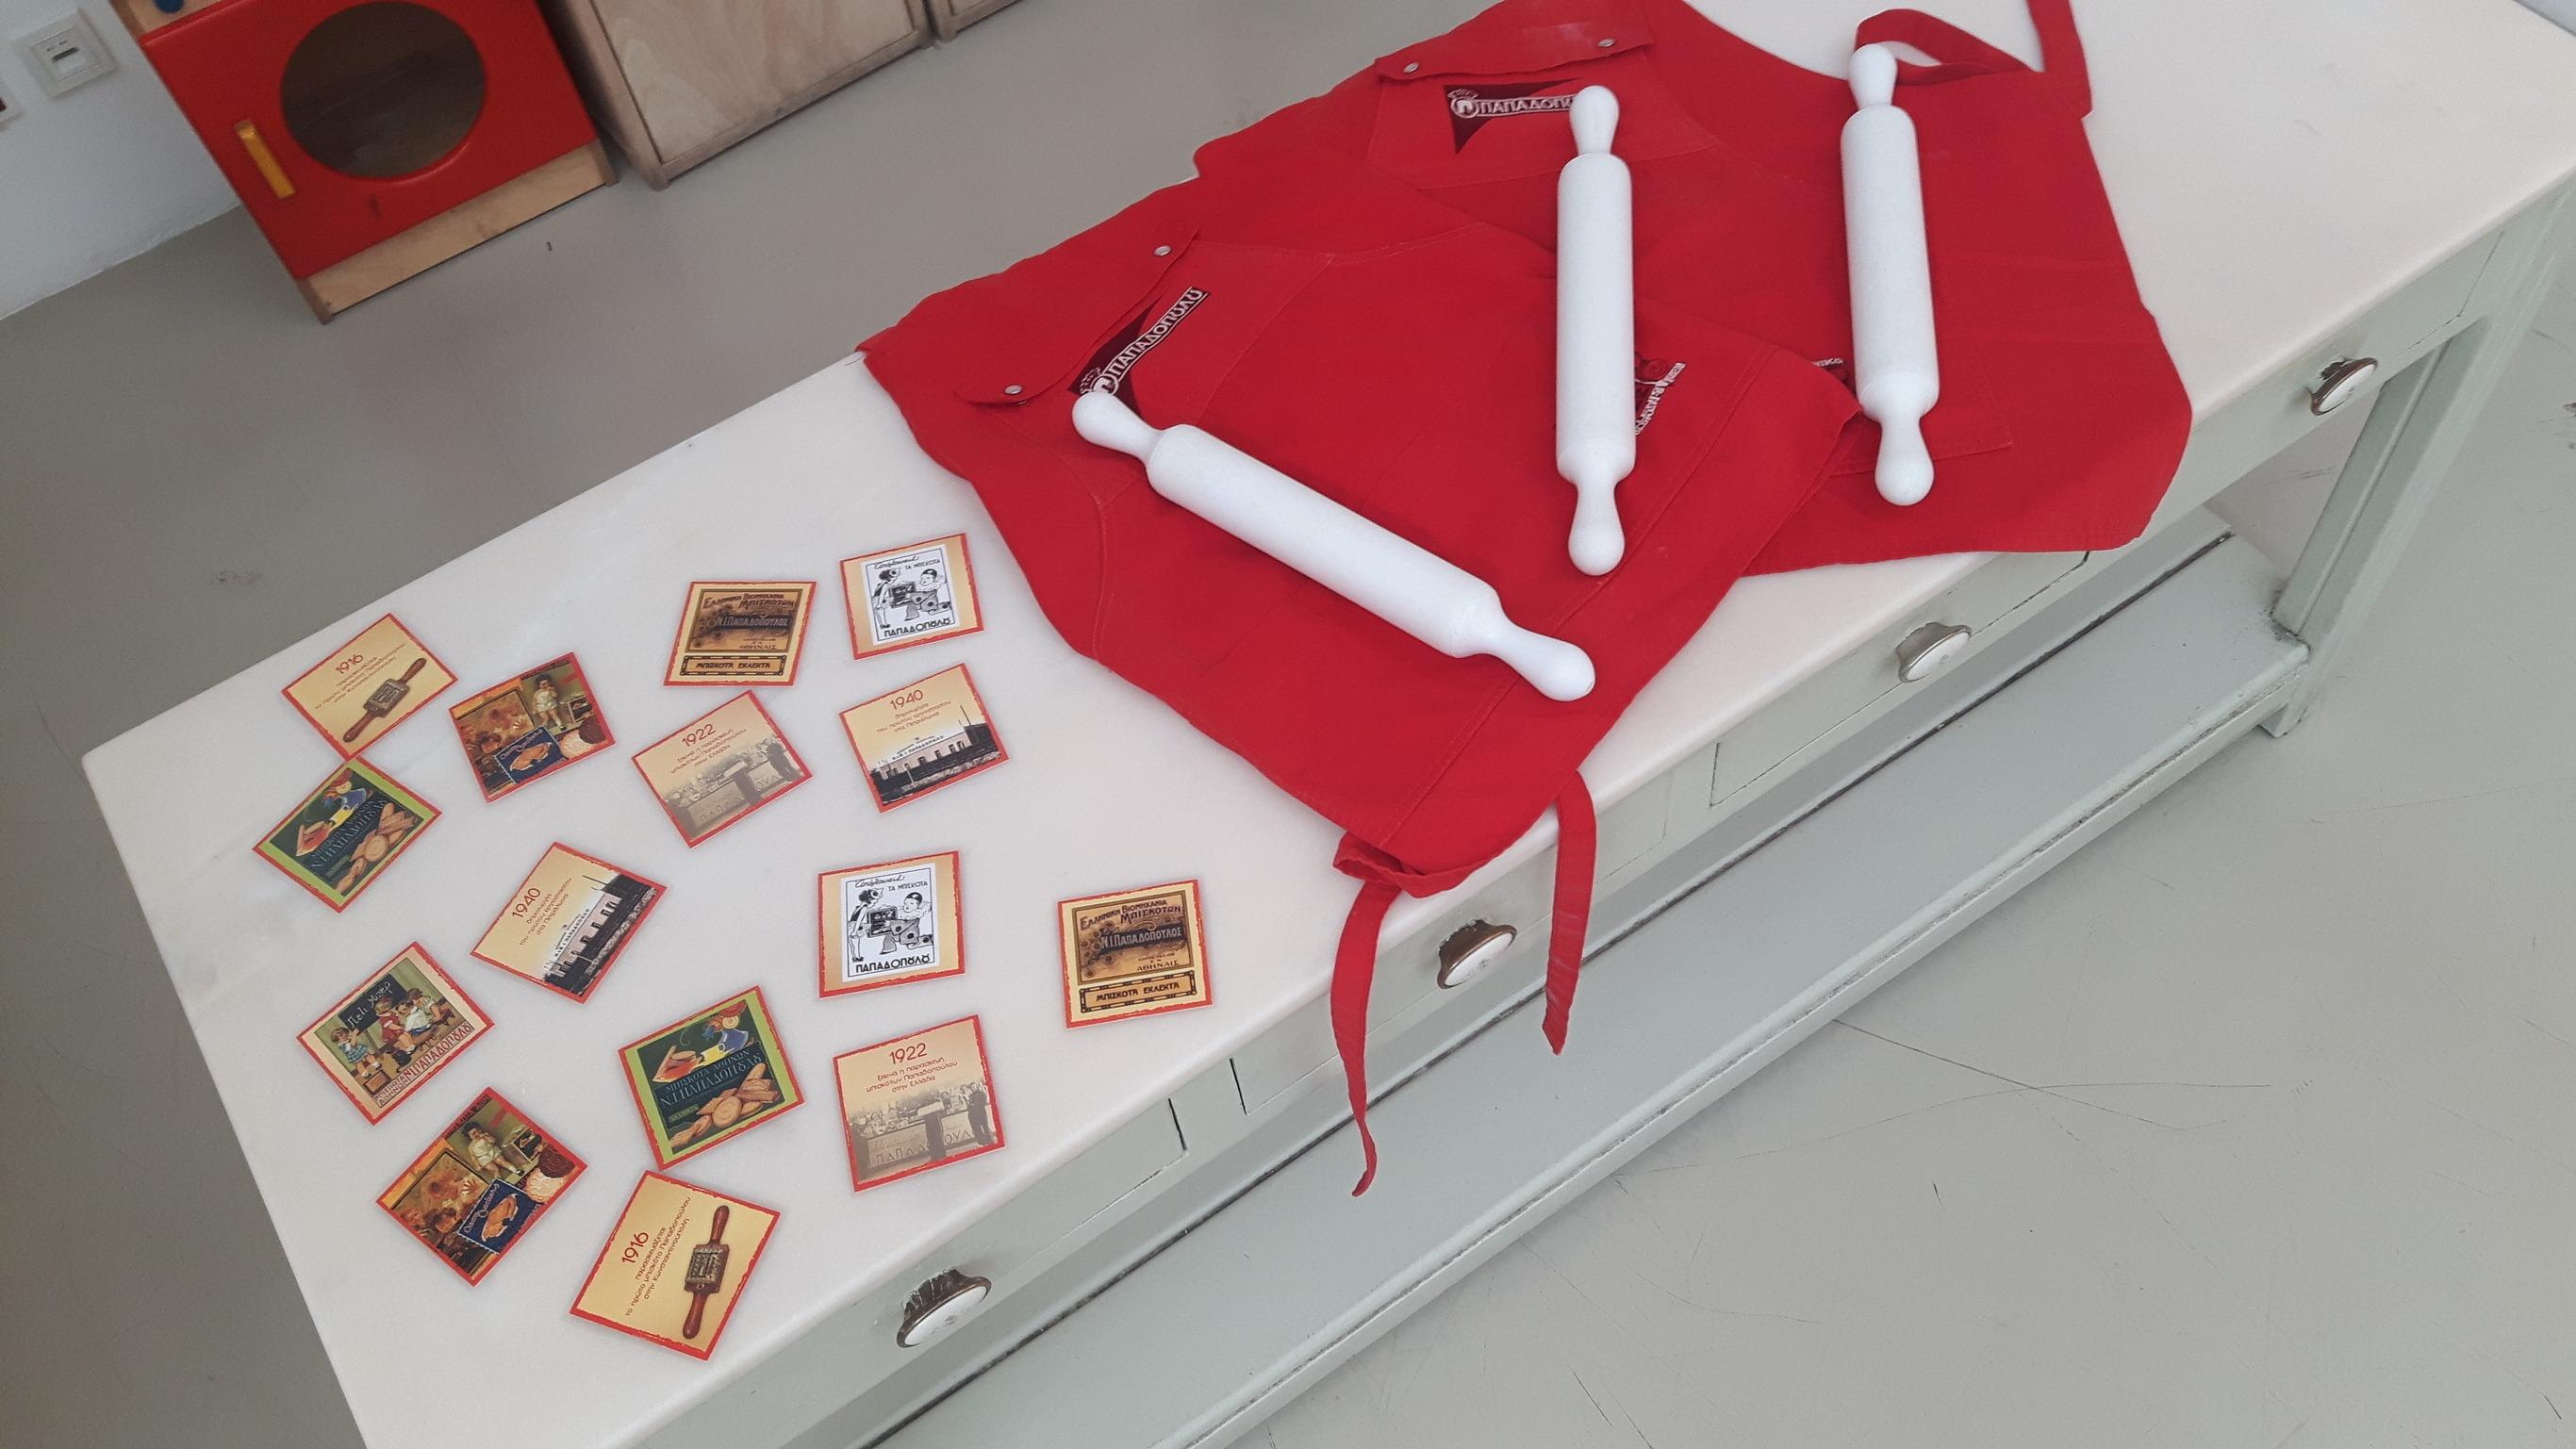 Image for Η συνεργασία μας με το Ελληνικό Παιδικό Μουσείο